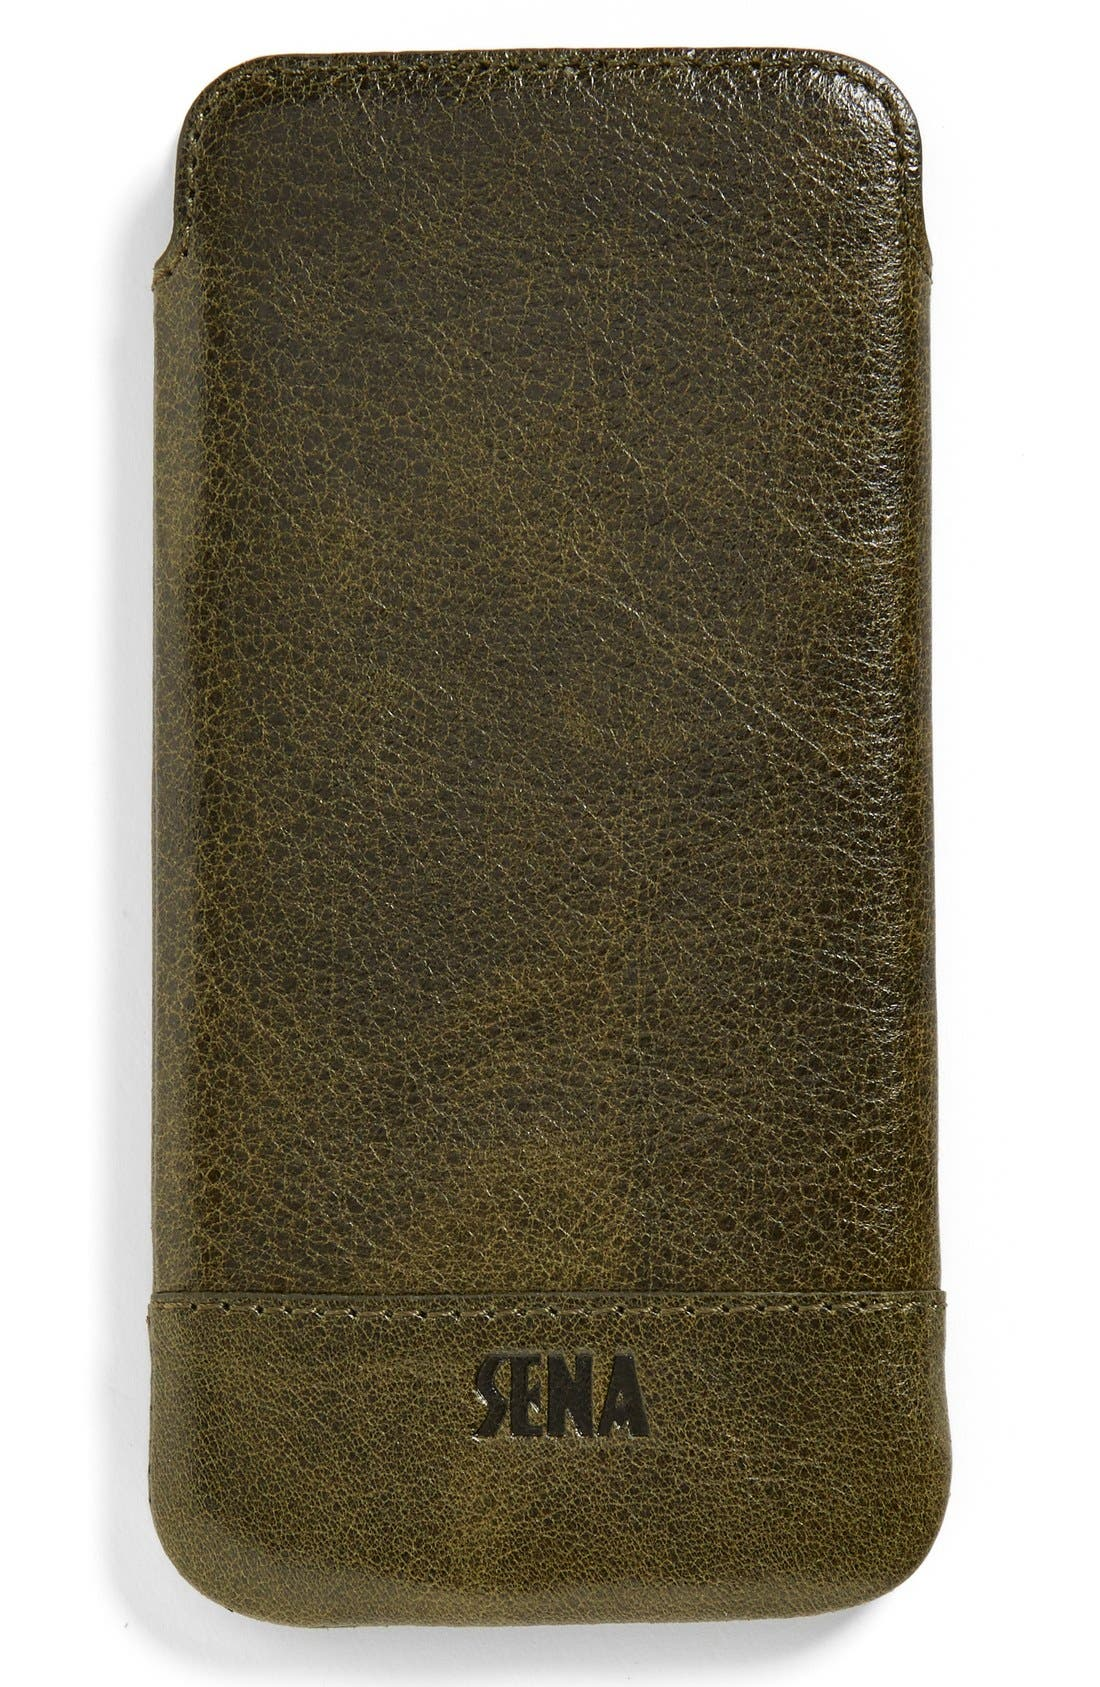 SENA Heritage Ultra Slim Leather iPhone 6/6s Case